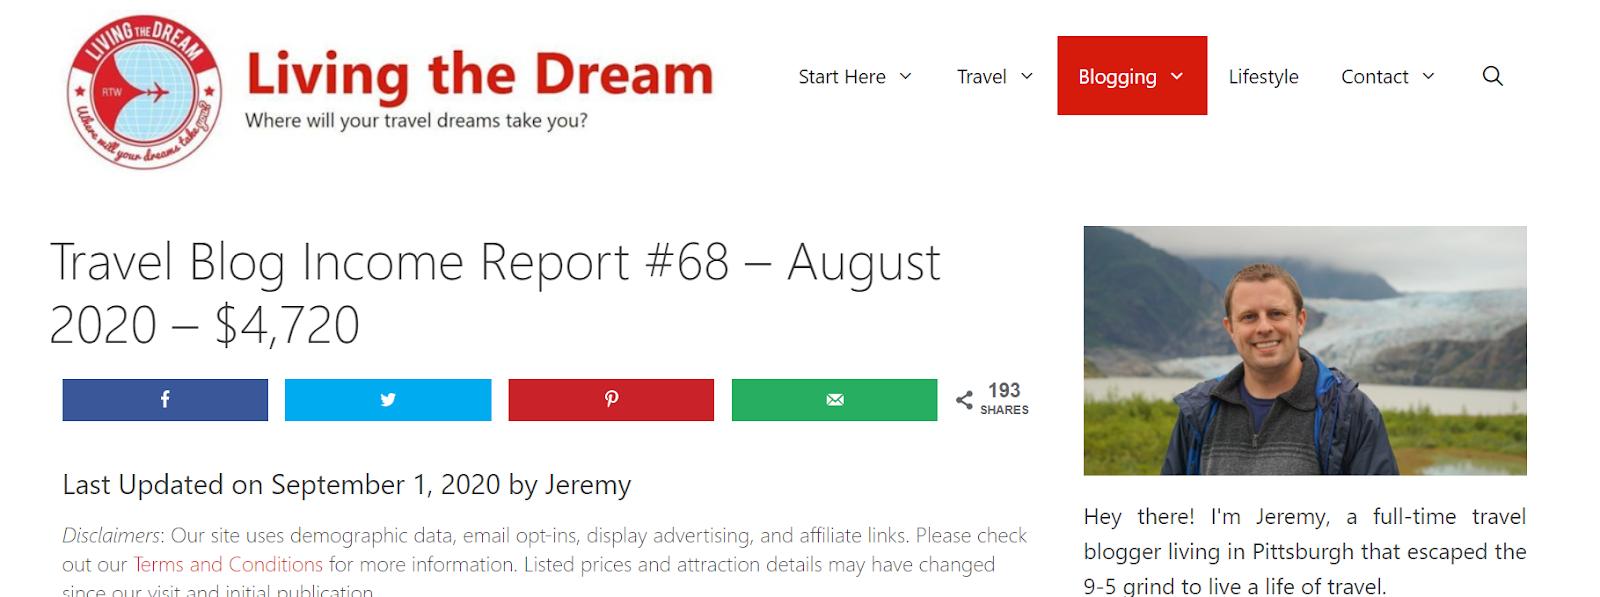 Living the Dream blog example